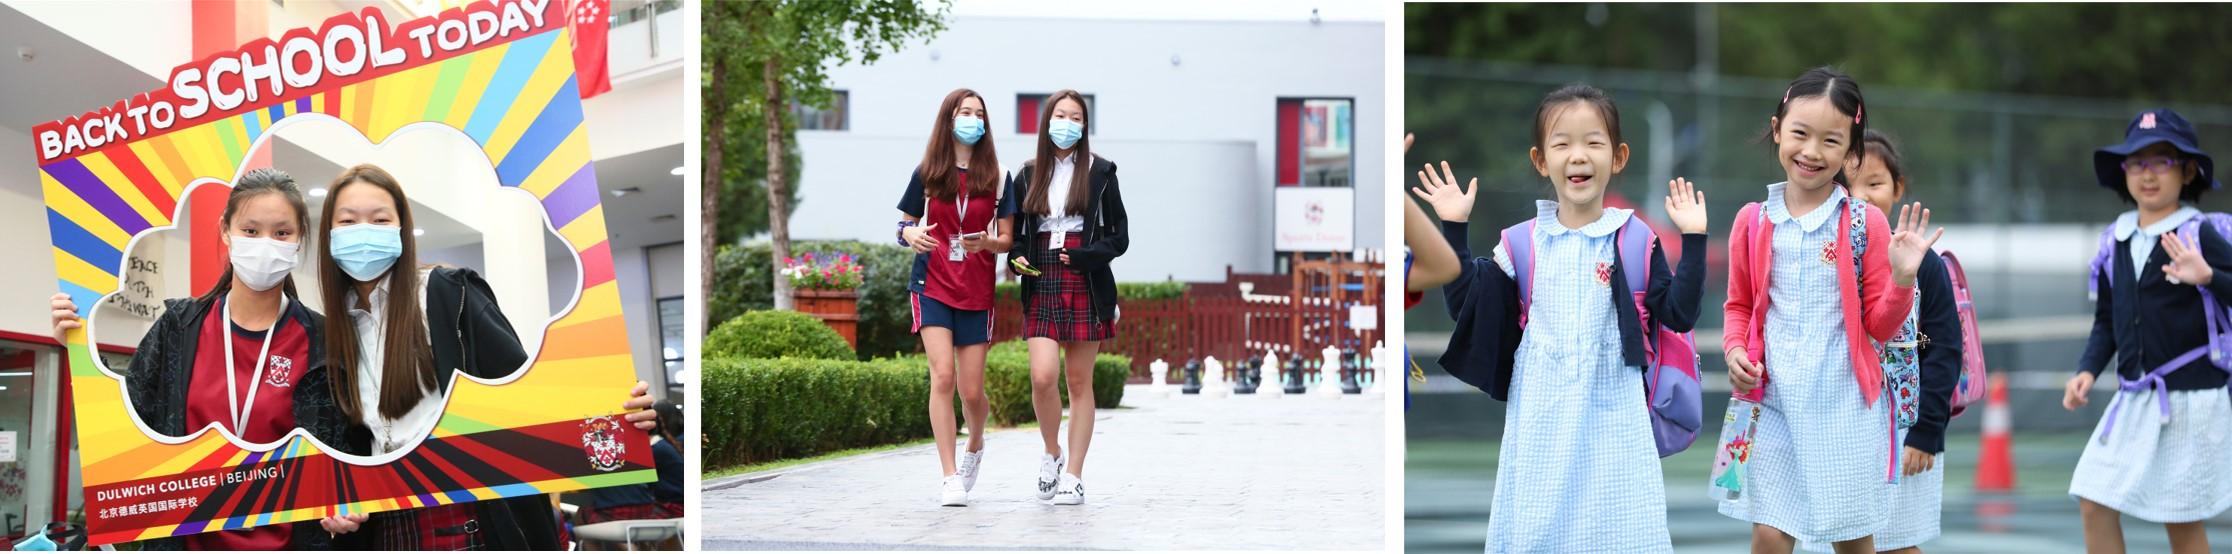 welcome-back-students-北京德威英国国际学校-20200907-102631-965